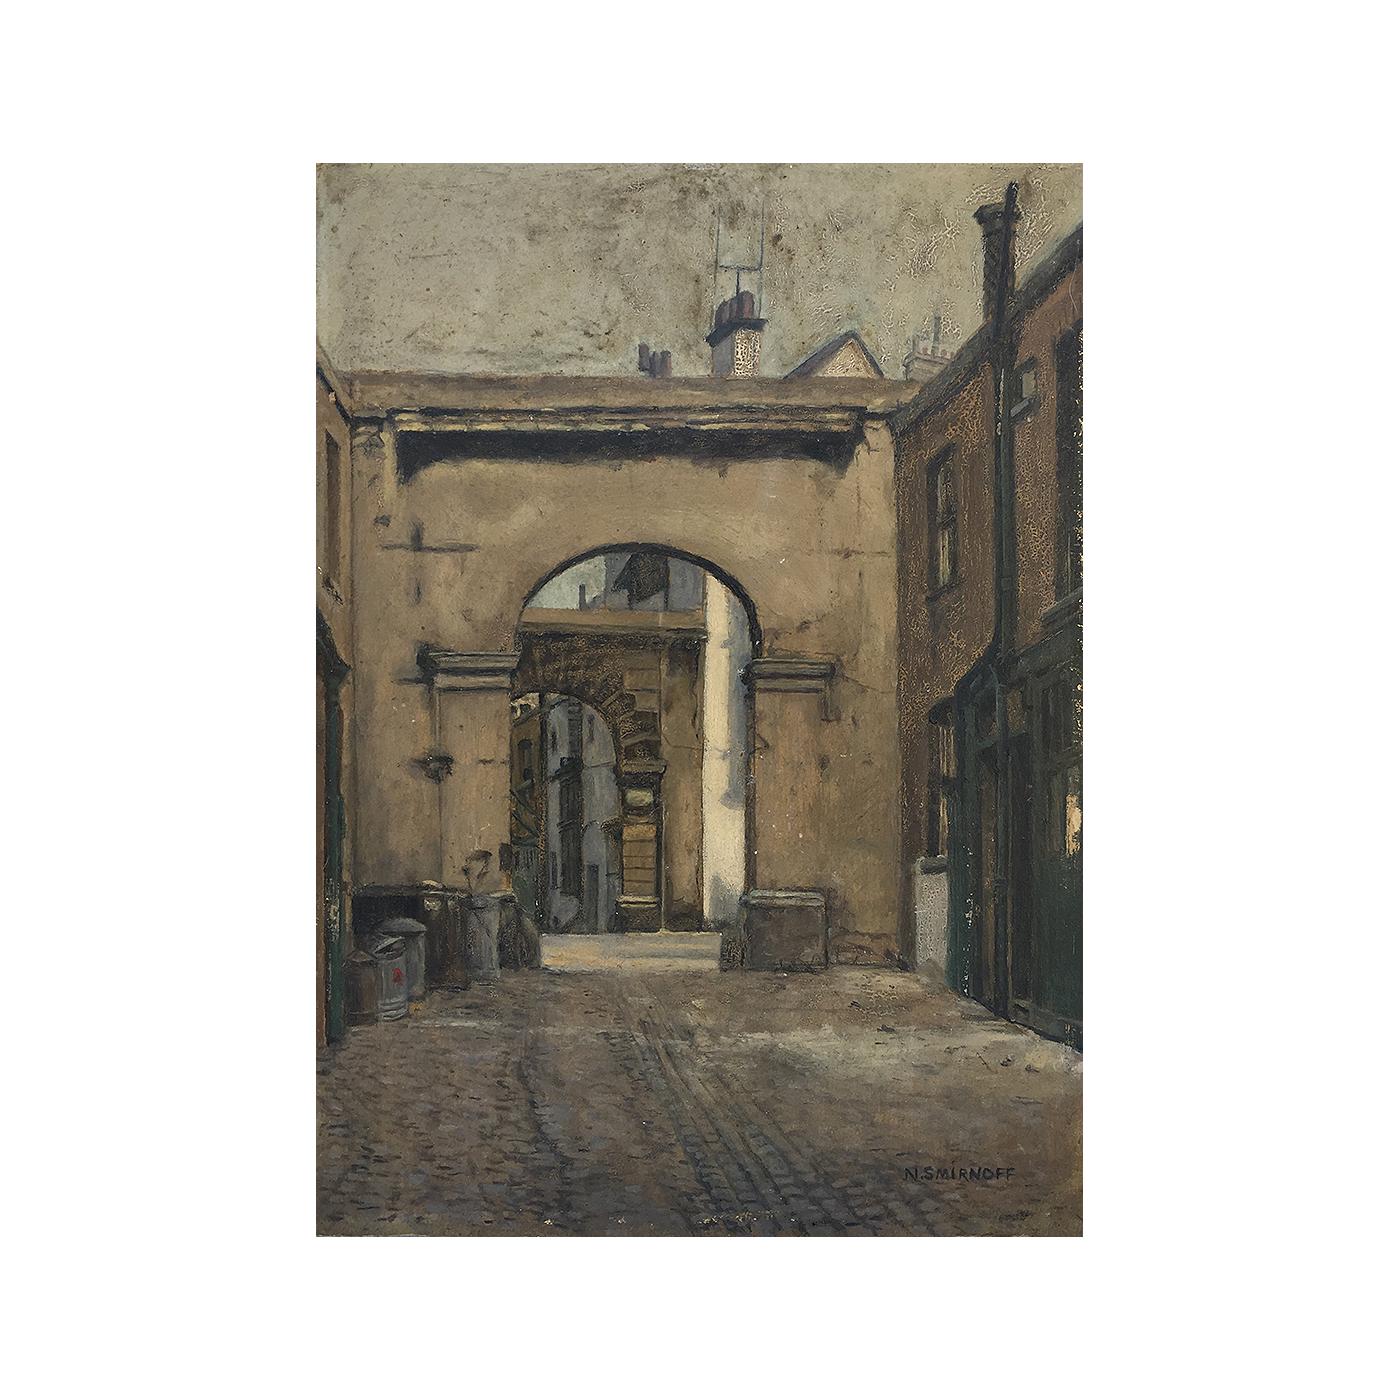 N. Smirnoff [early 20th century] realist painting : The alleyway, ca.1910.